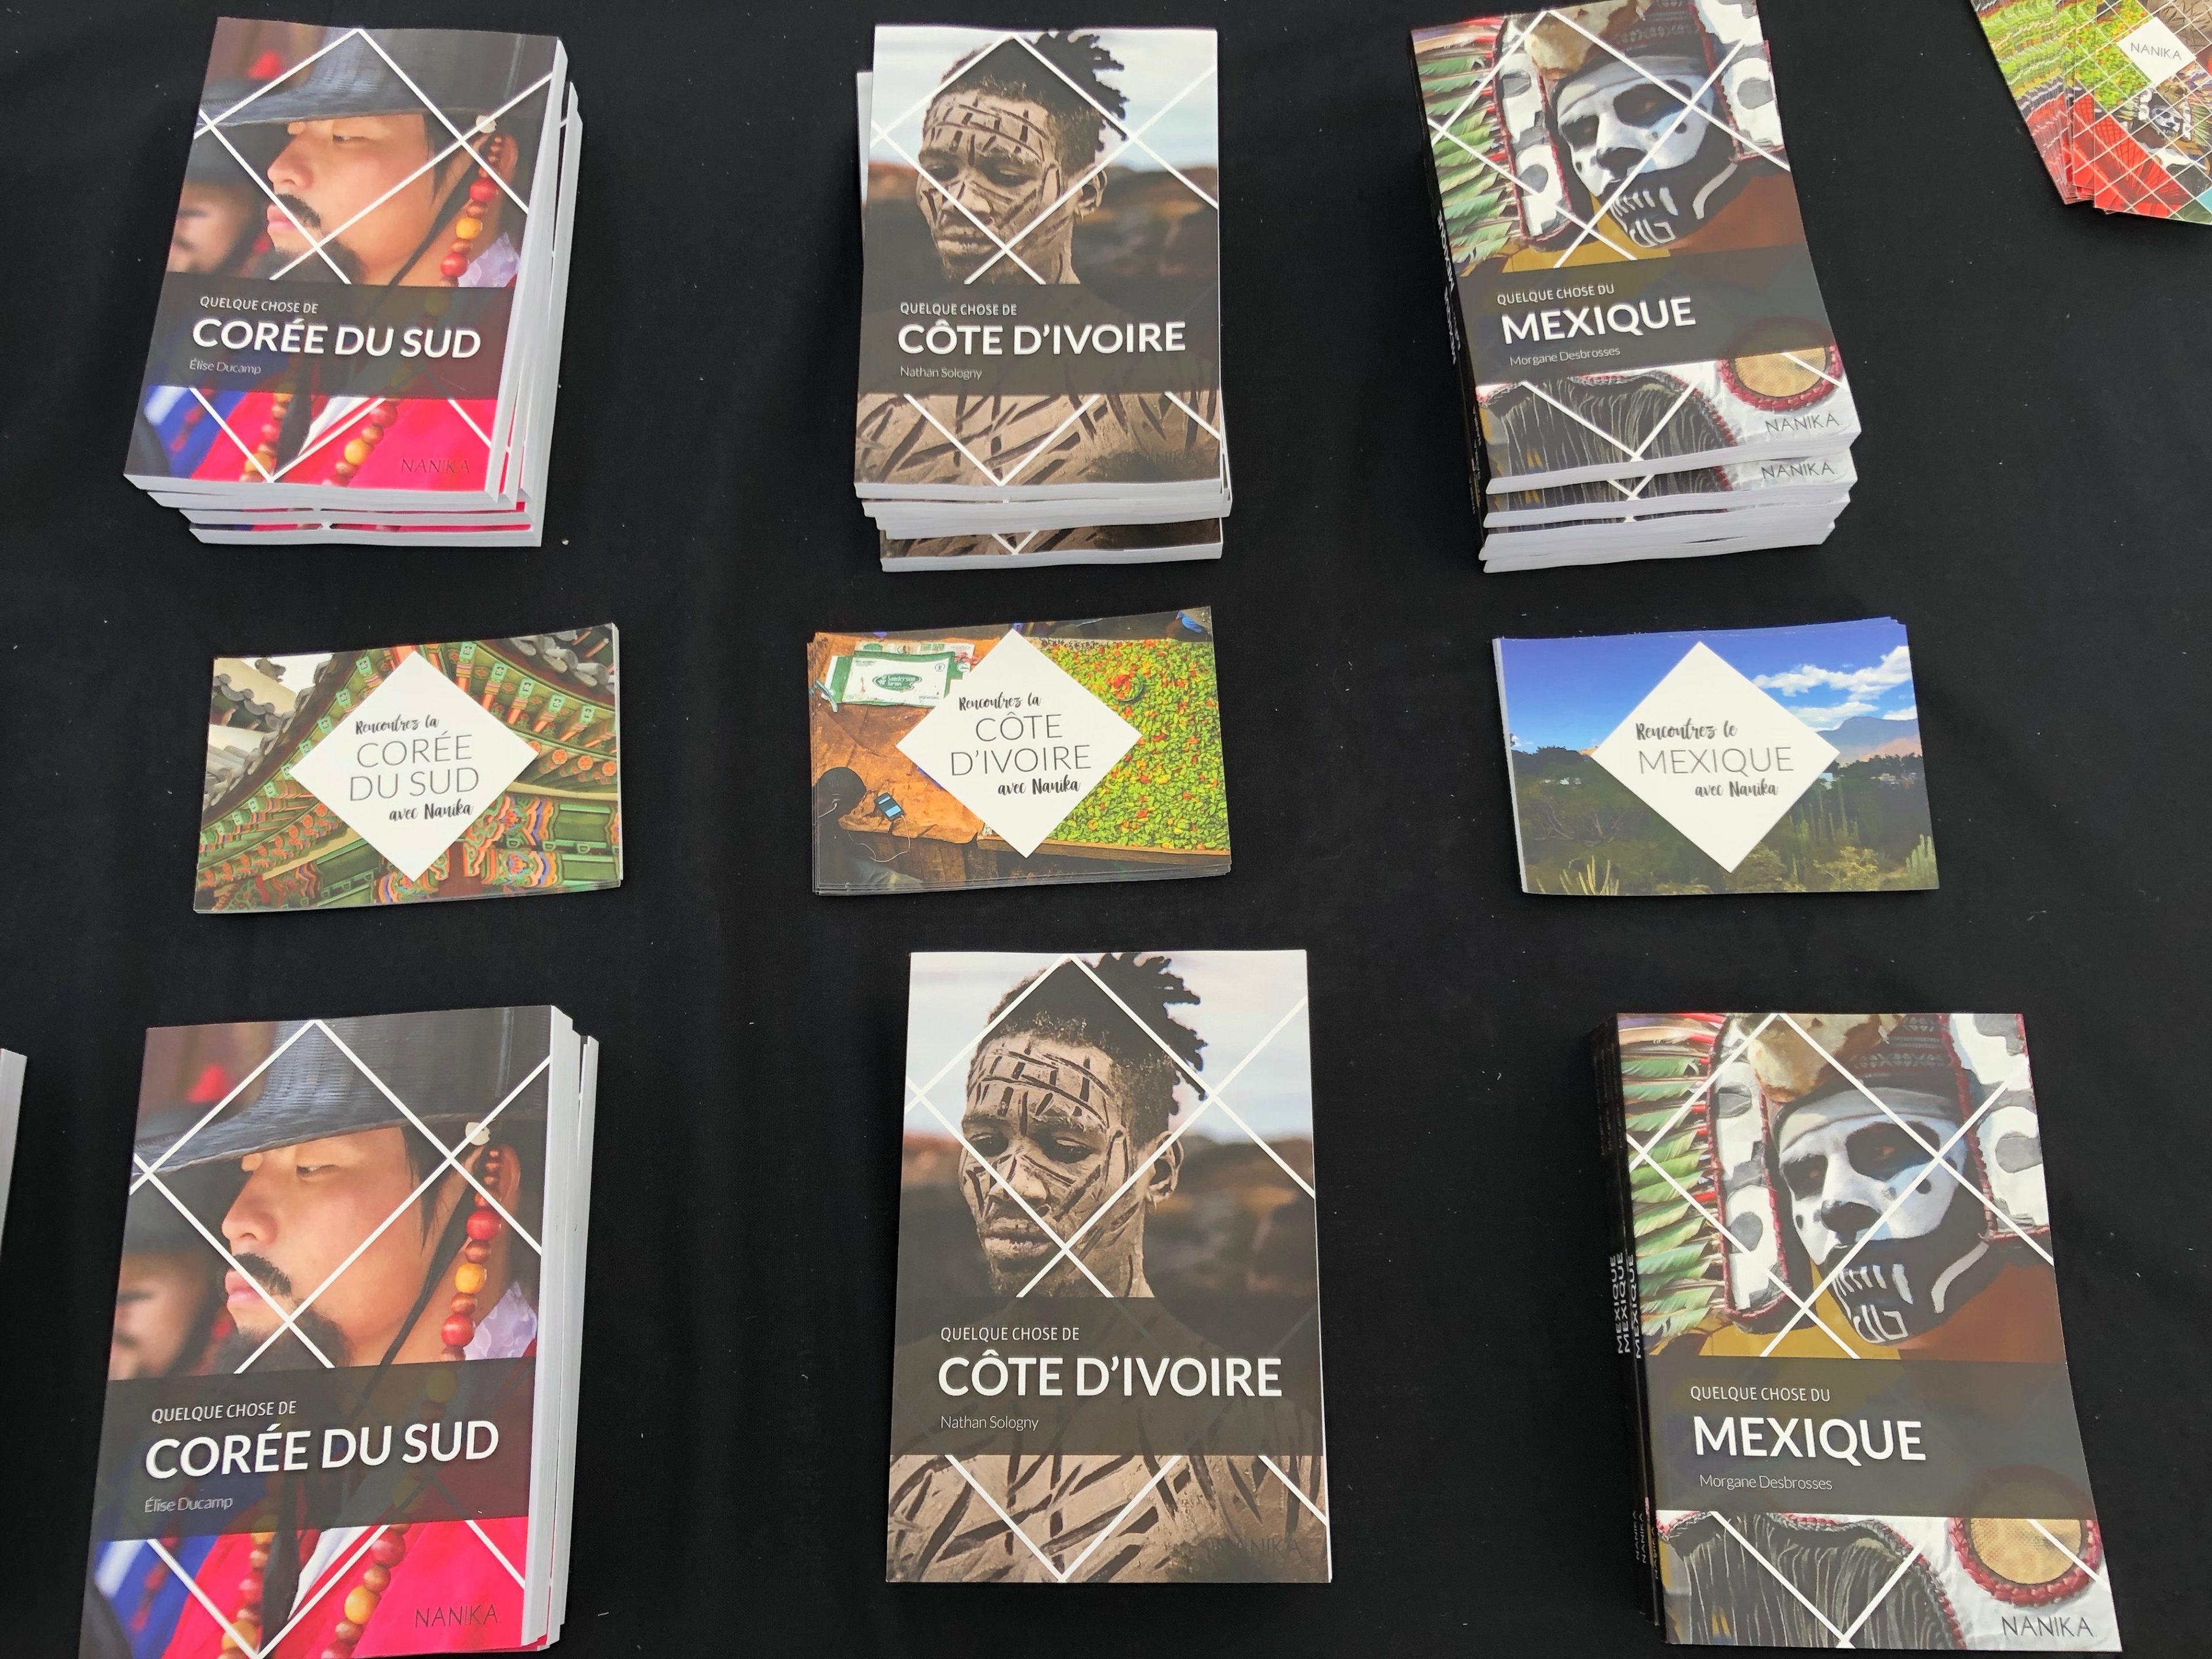 Editions Nanika guides de voyage